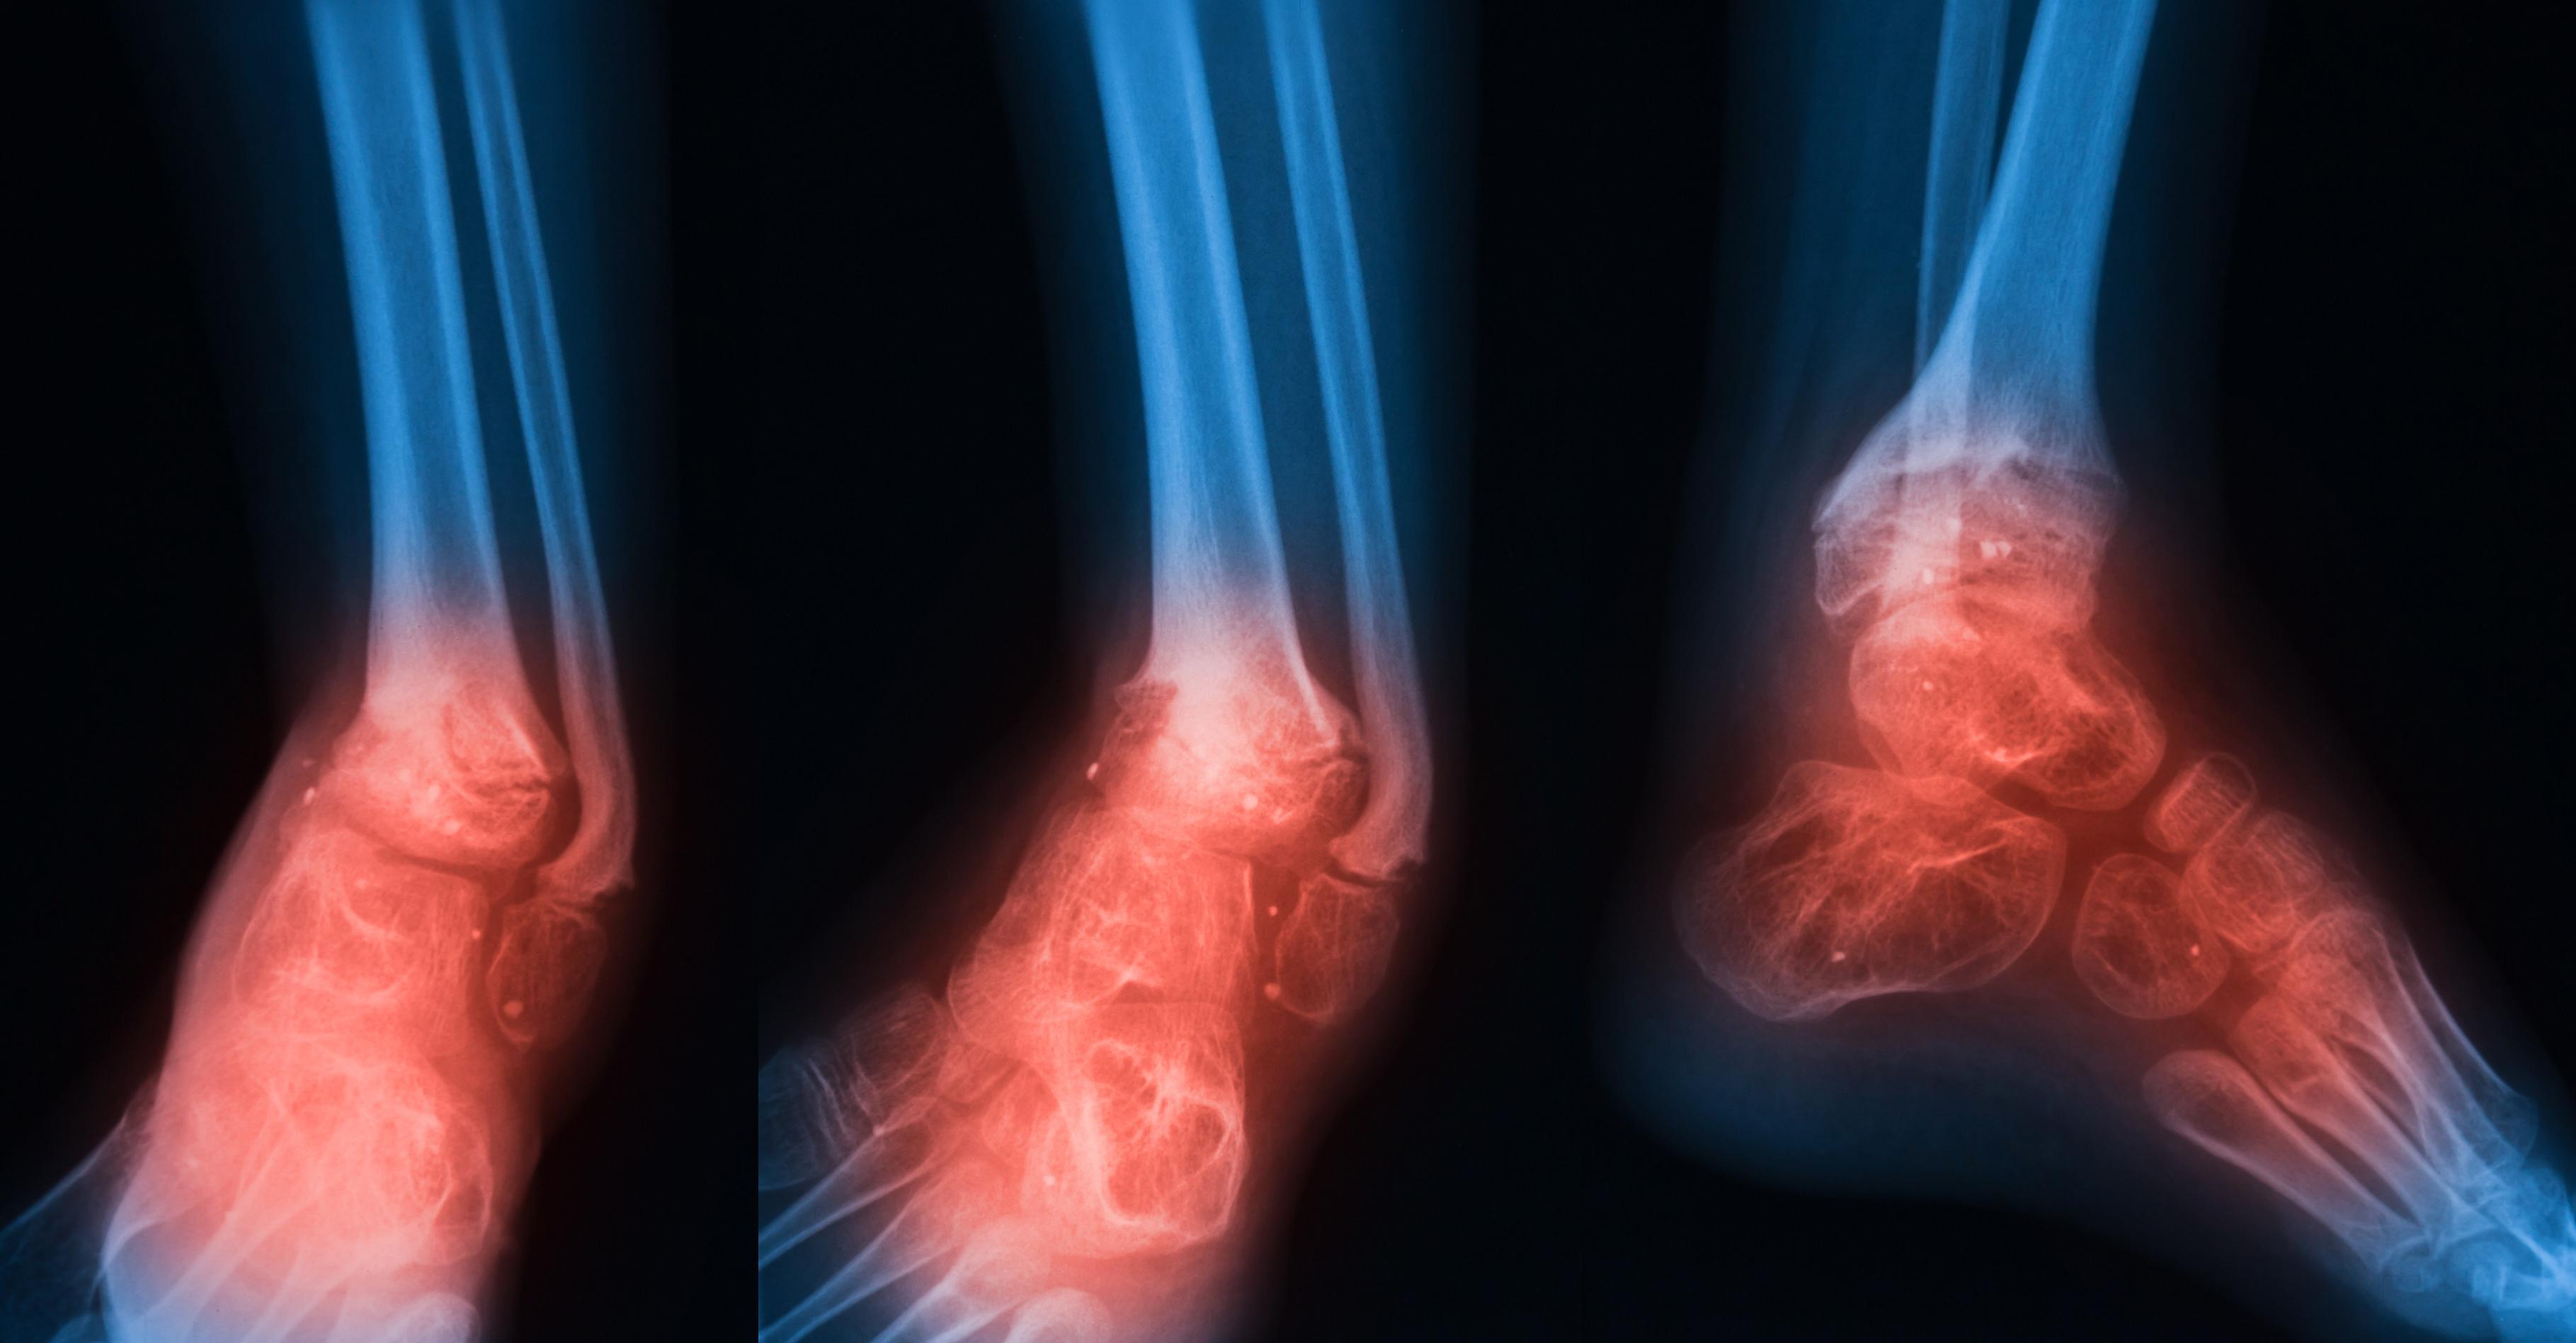 Diabetes Foot disease: An MDT approach to chronic diabetes foot disease management